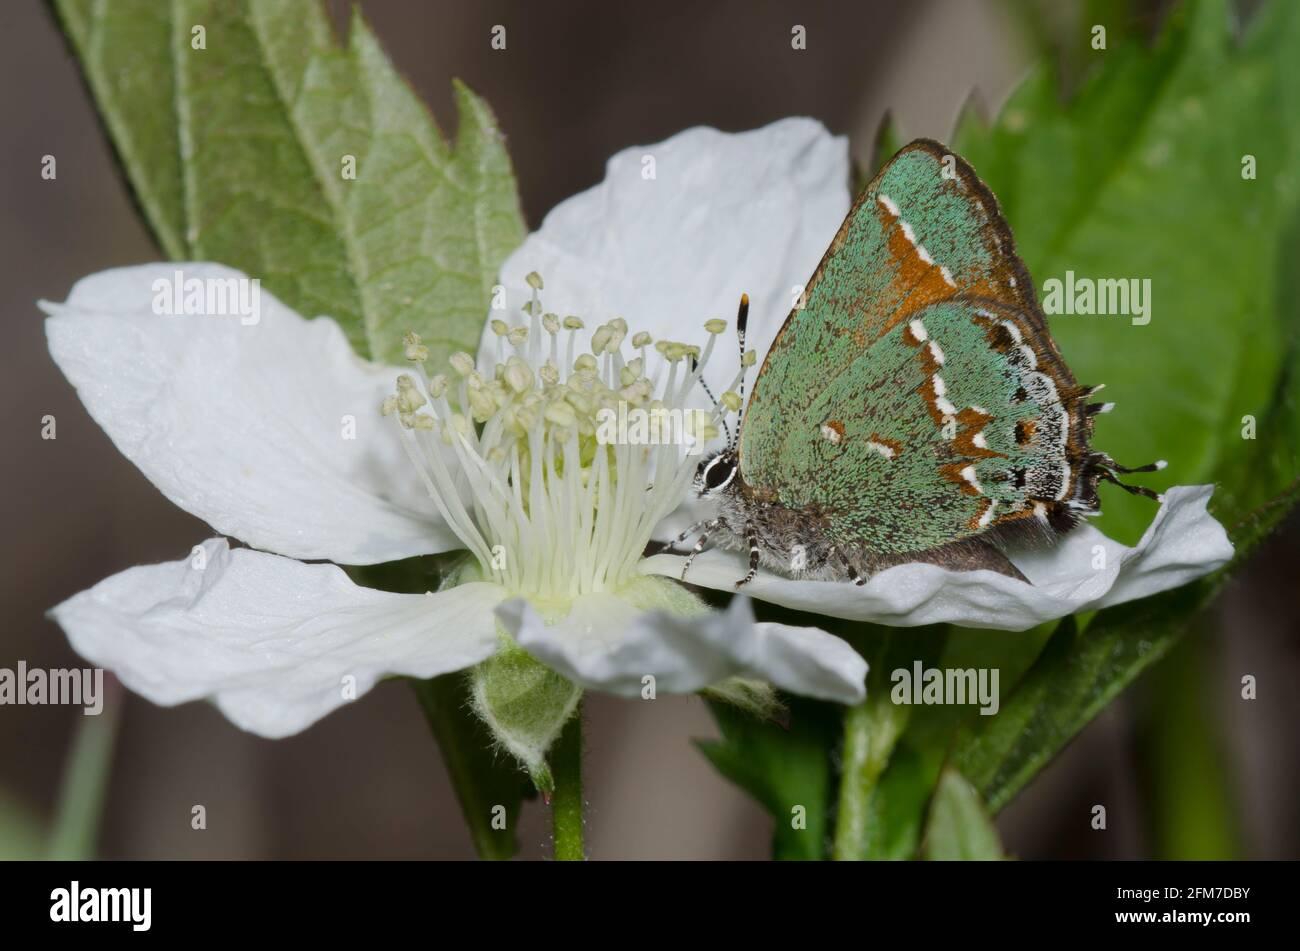 Juniper Hairstreak, Callophrys gryneus, nectaring da mora, Rubus sp. Foto Stock